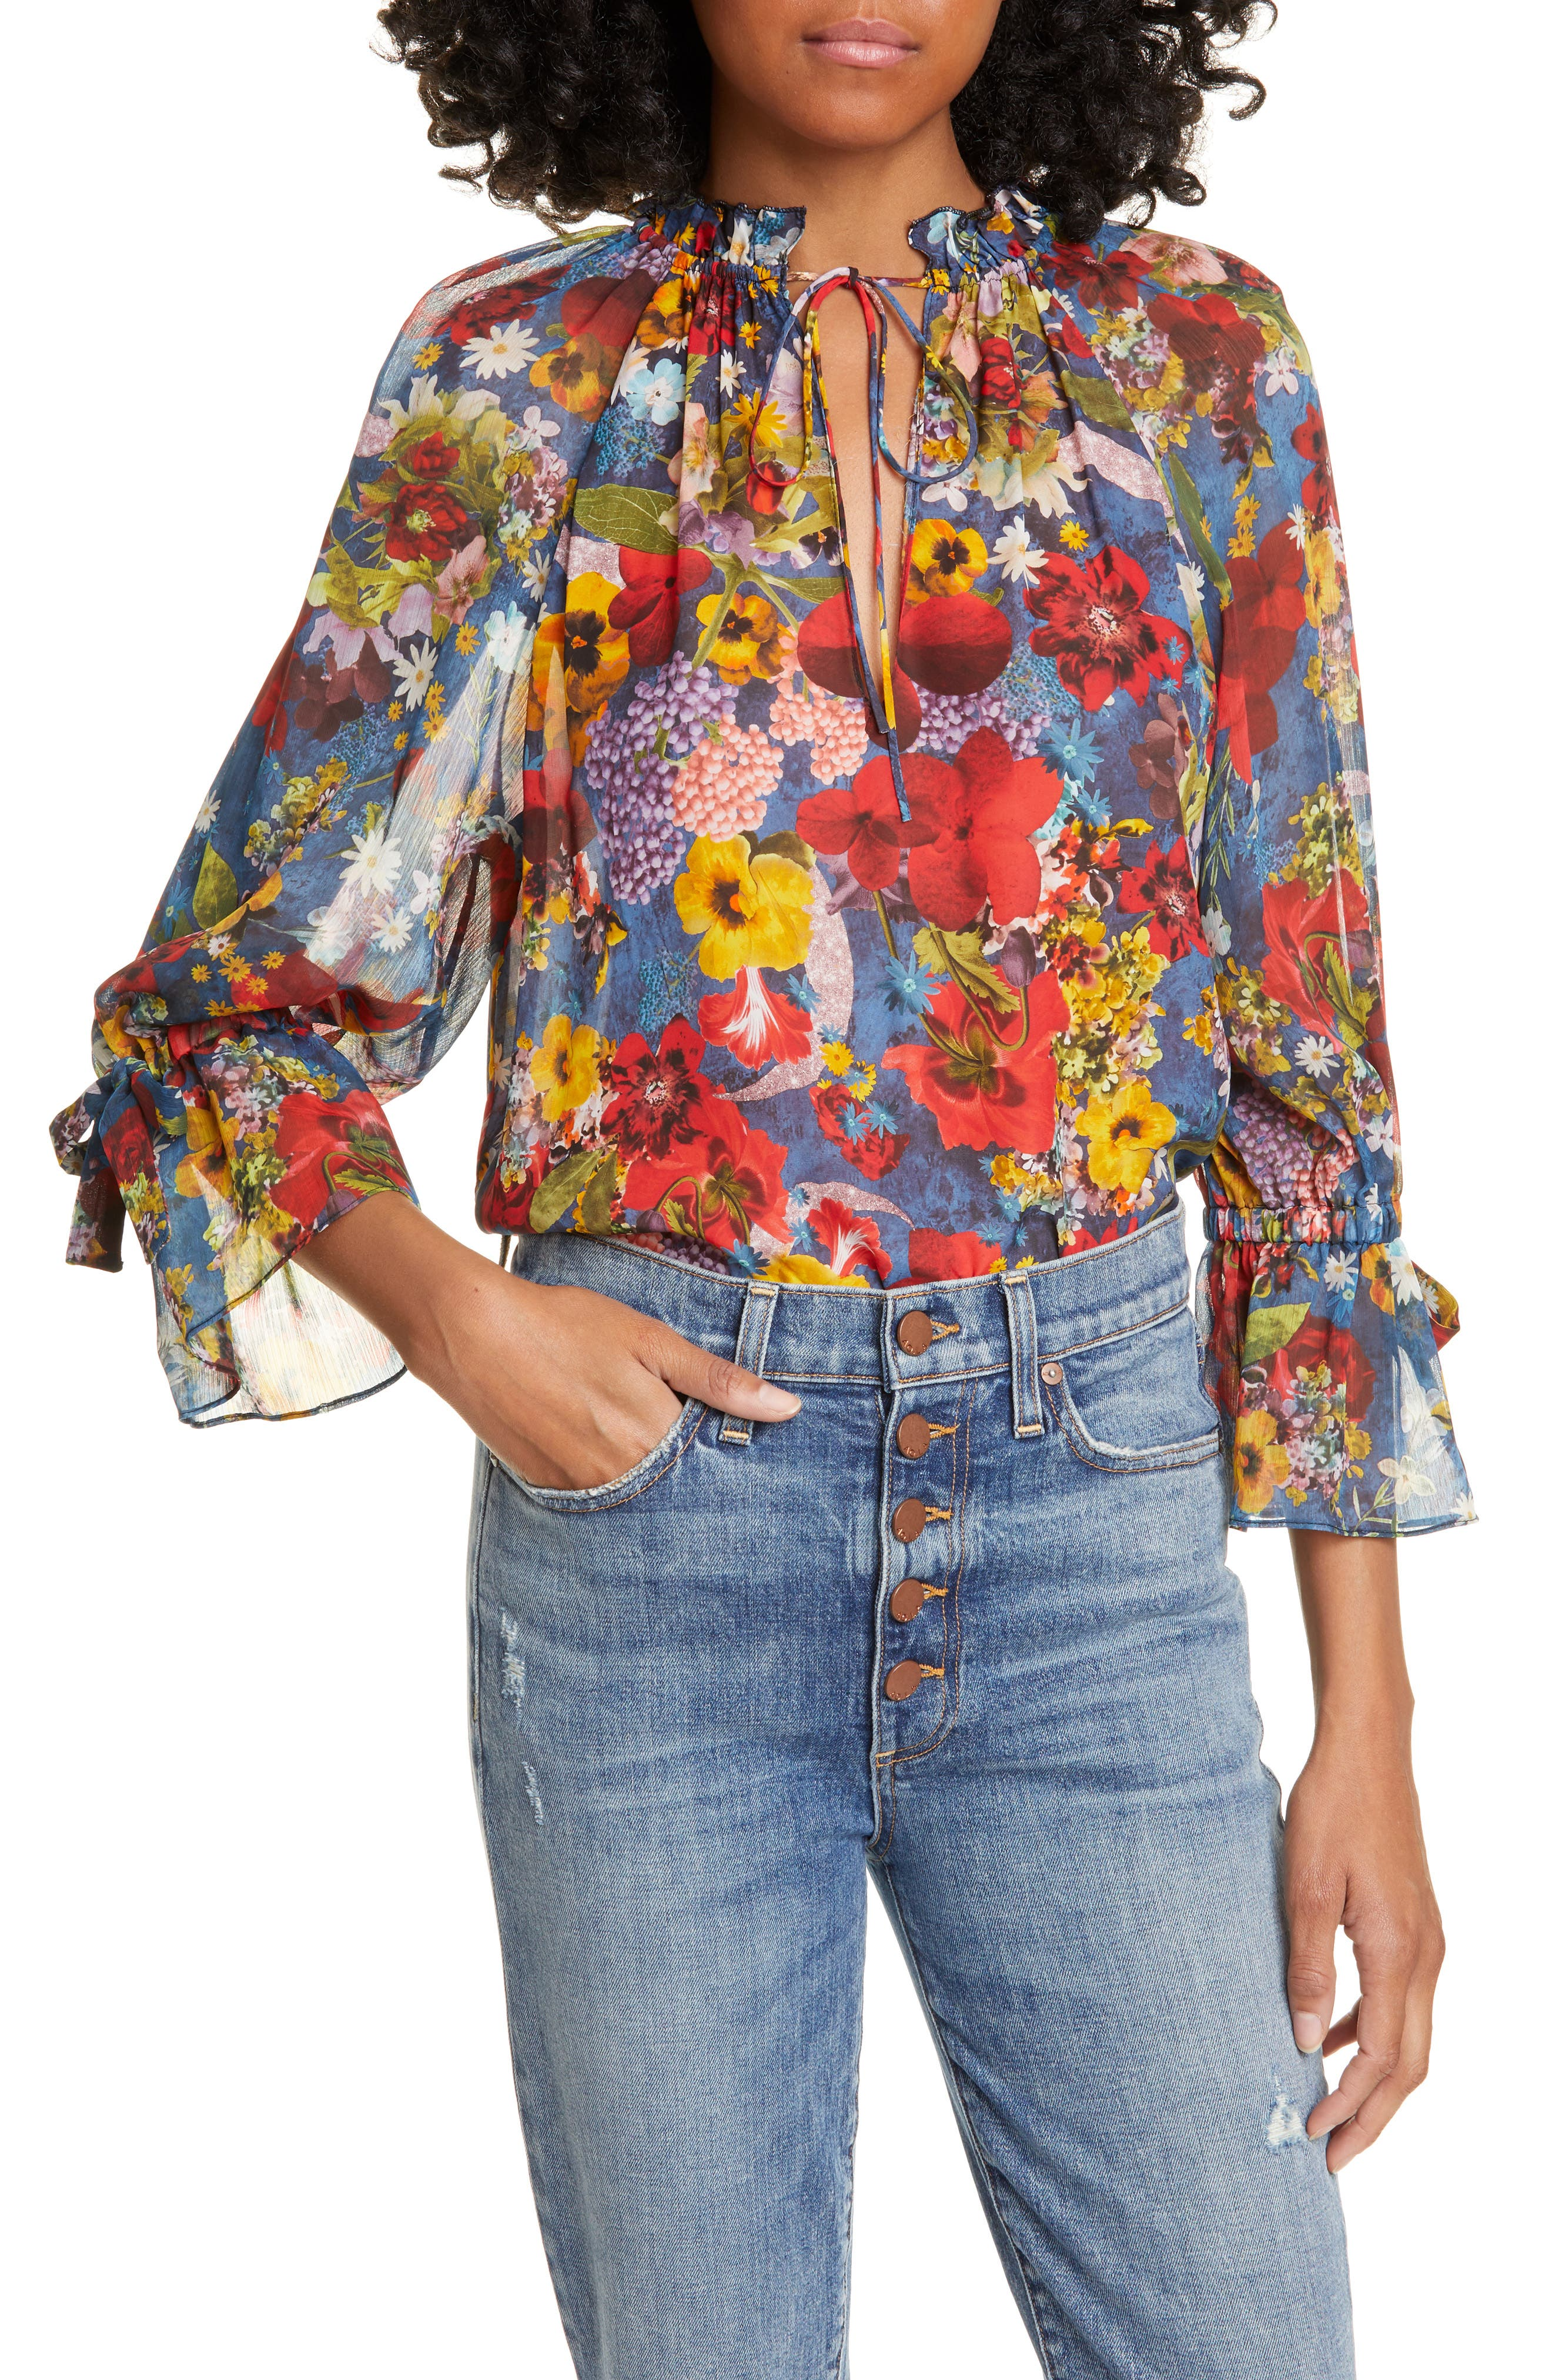 60s Shirts, T-shirt, Blouses | 70s Shirts, Tops, Vests Womens Alice  Olivia Julius Floral Print Raglan Sleeve Blouson Tunic $265.00 AT vintagedancer.com